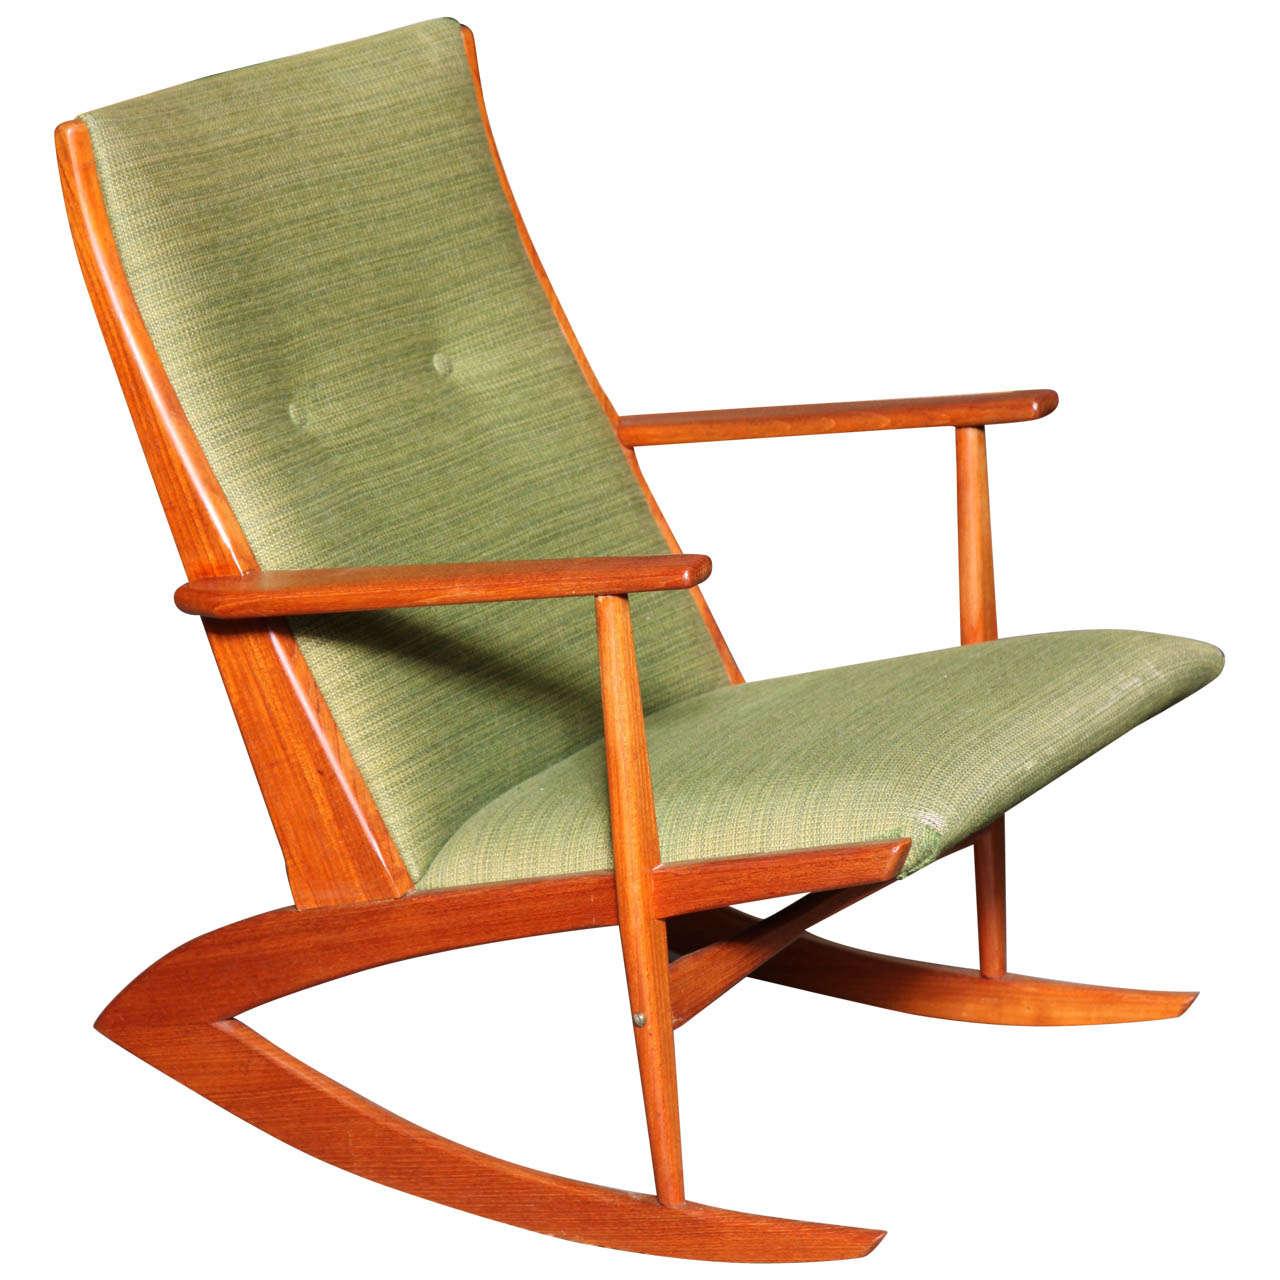 Danish Modern Teak Rocking Chair by Soren Georg Jensen at 1stdibs